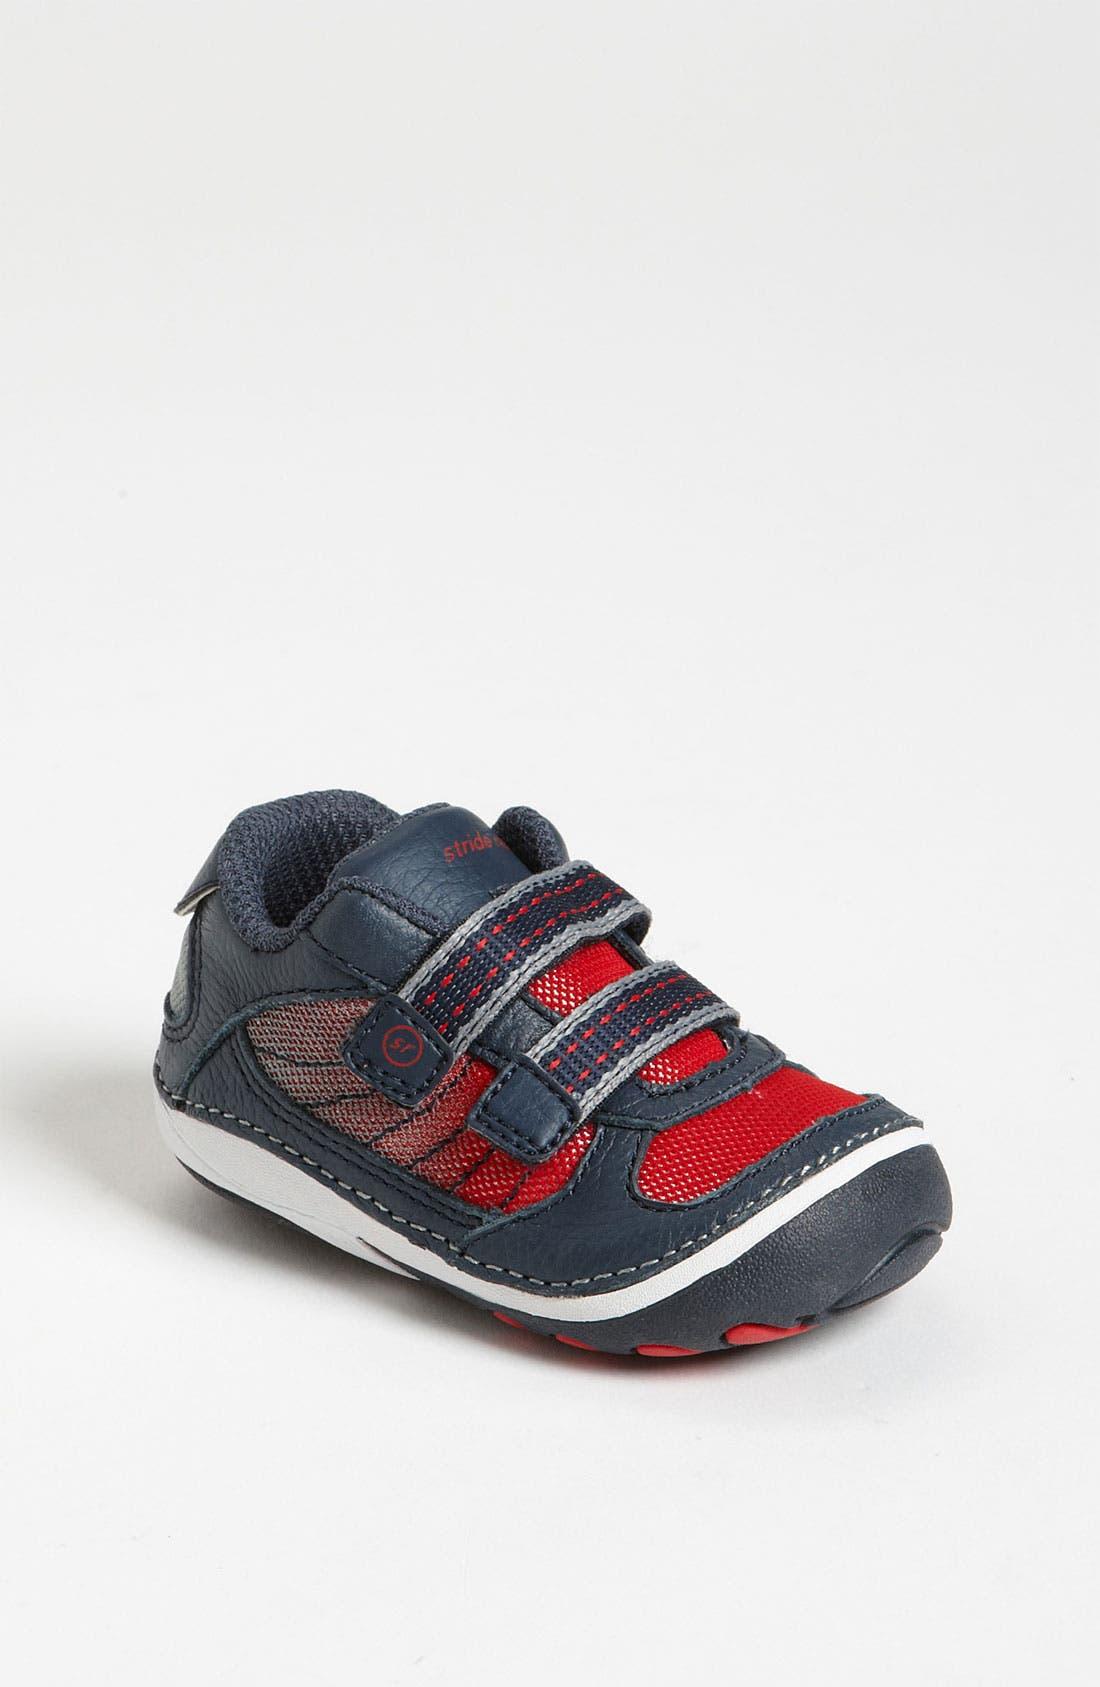 Main Image - Stride Rite 'Ronaldo' Sneaker (Baby & Walker)